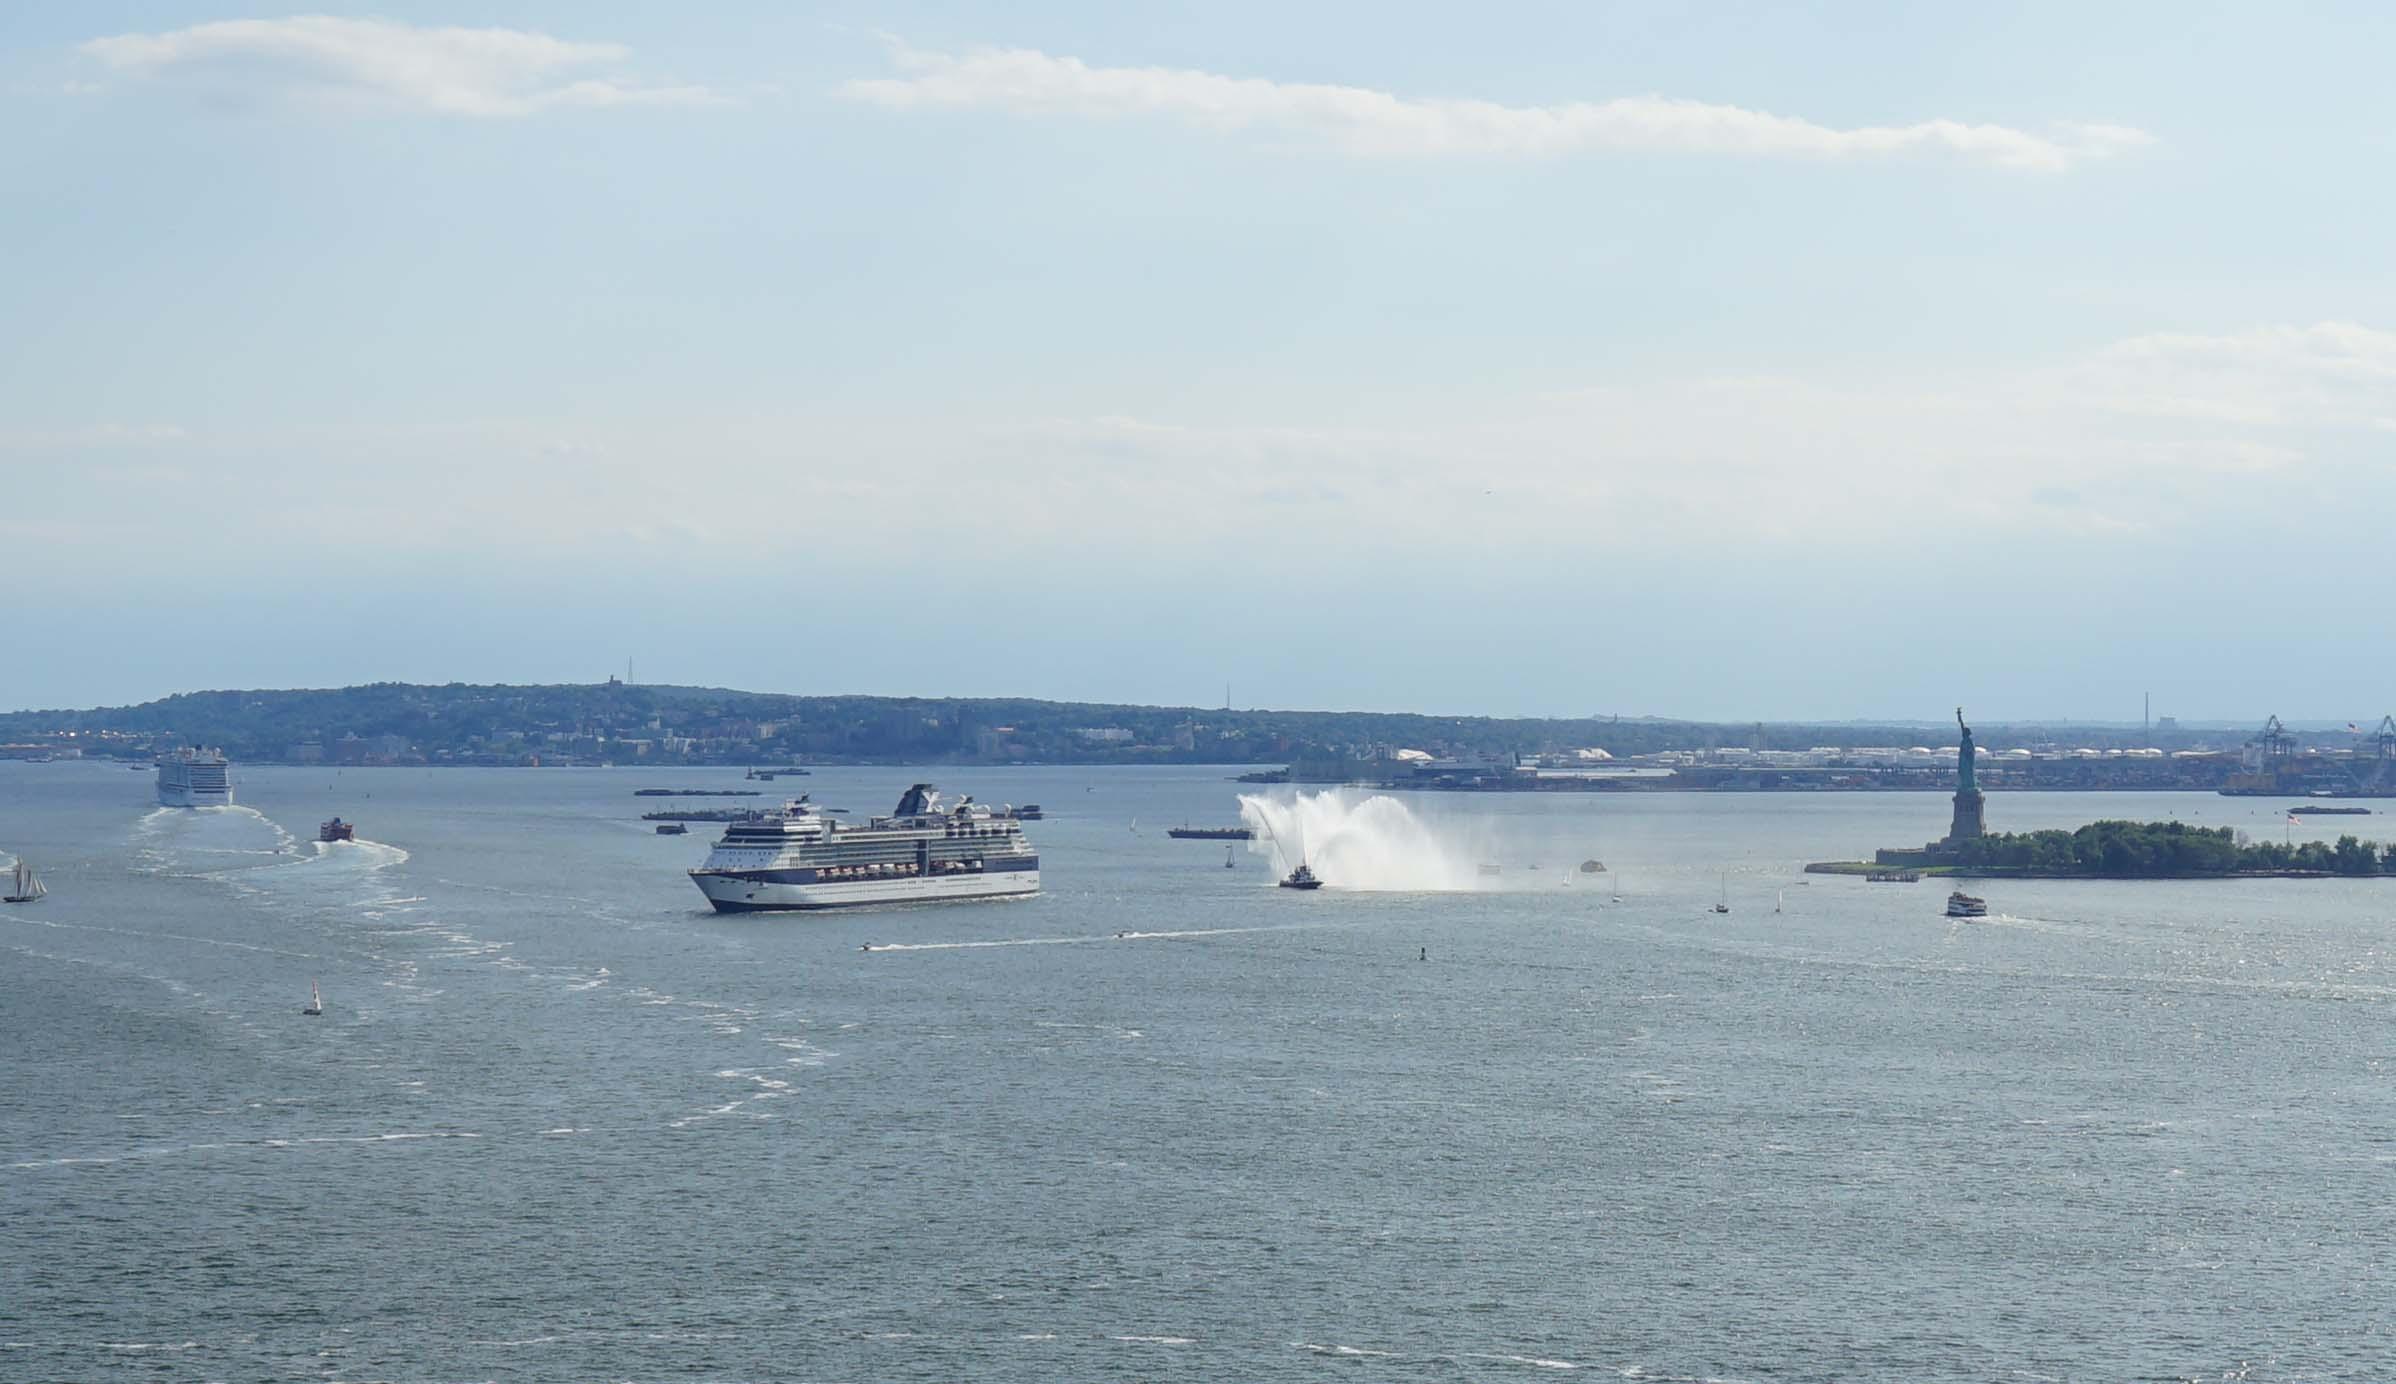 fire boat cruise ship